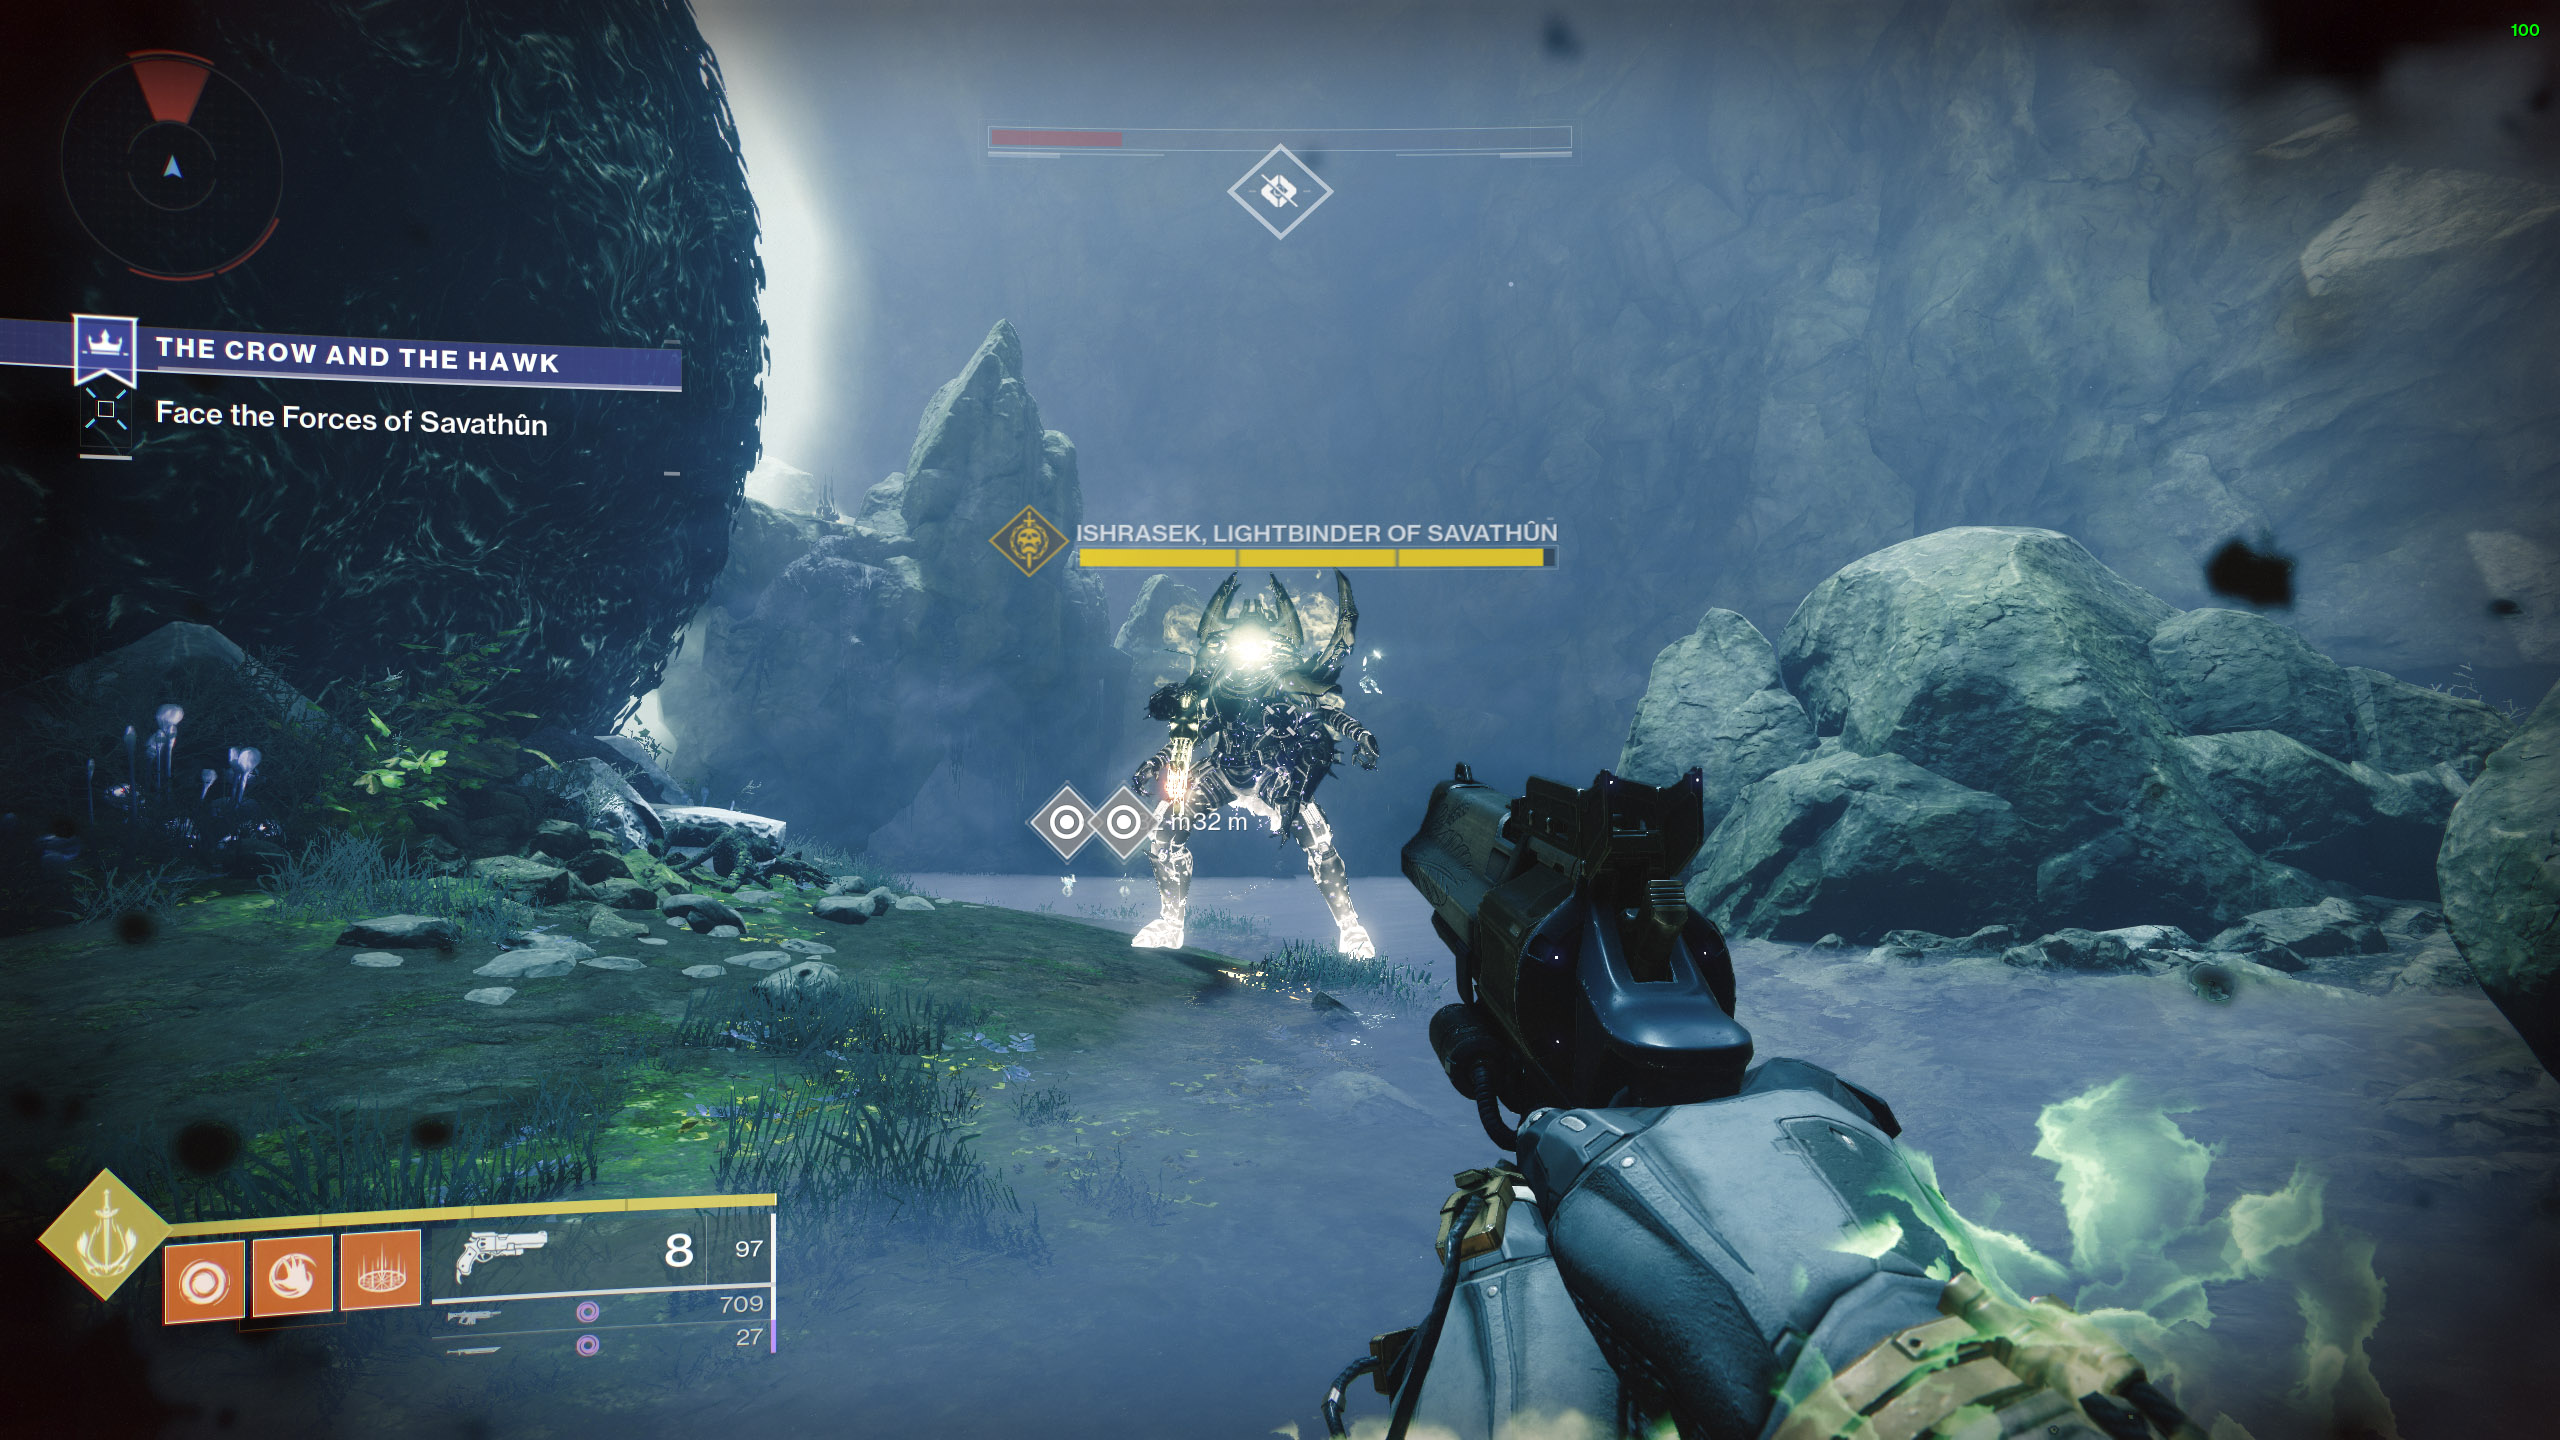 destiny 2 defeat Ishrasek Lightbinder of Savathun